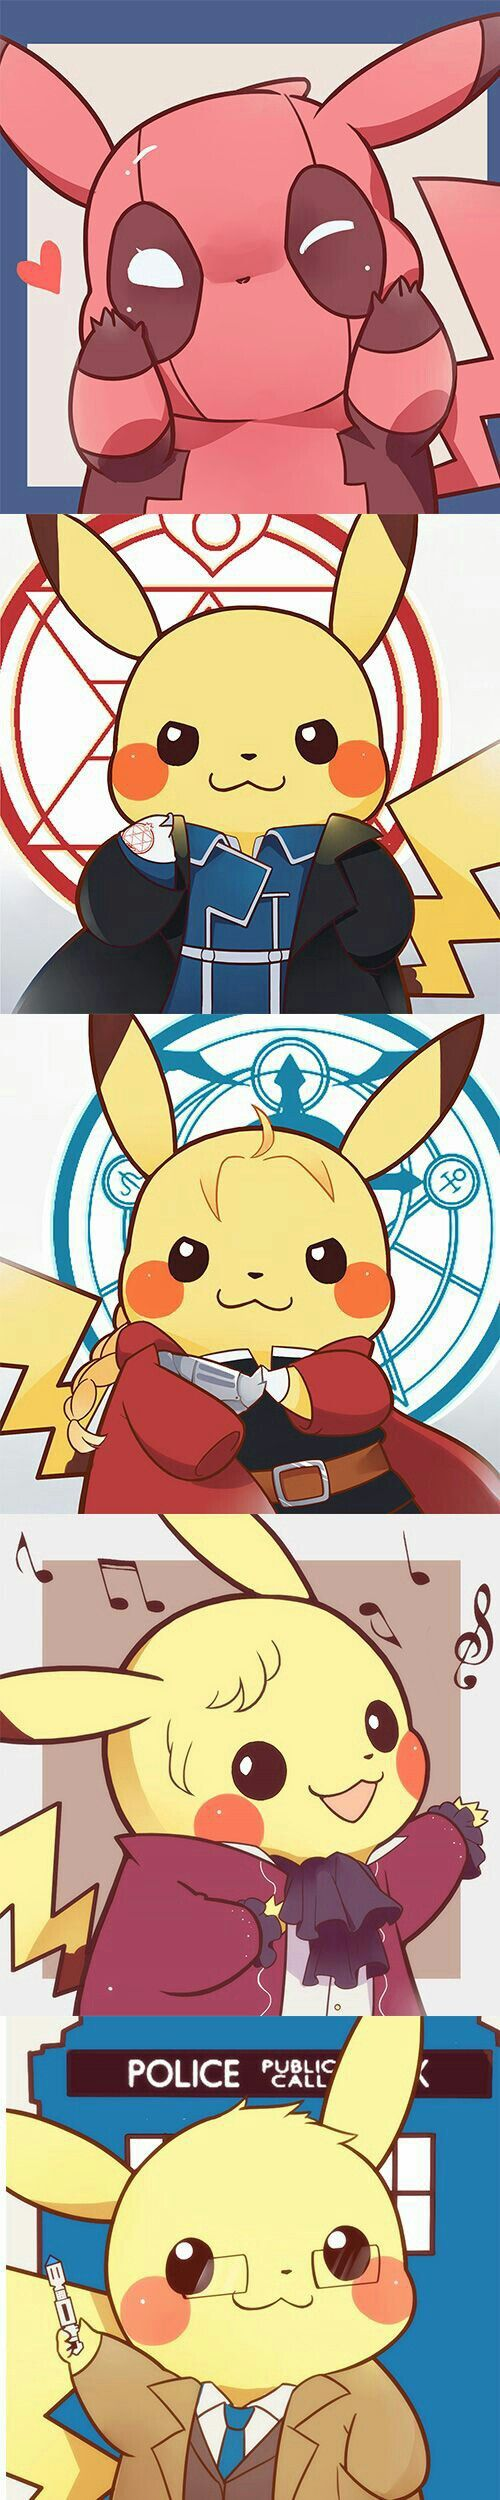 deadpool pikachu roy mustang pikachu edward elric